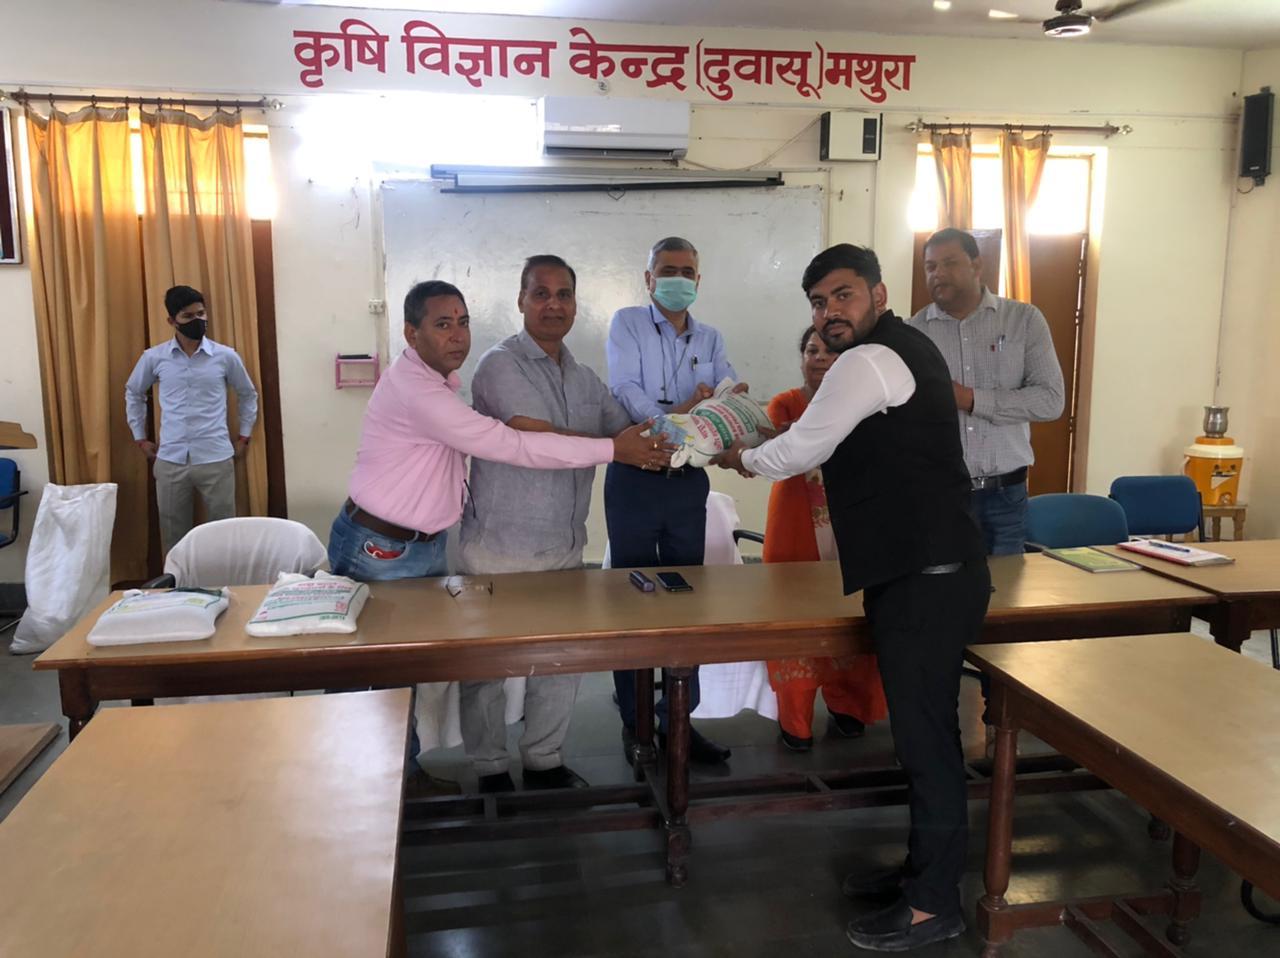 Moong seed distribution under CFLD at KVK DUVASU Mathura on 16 th March 2021